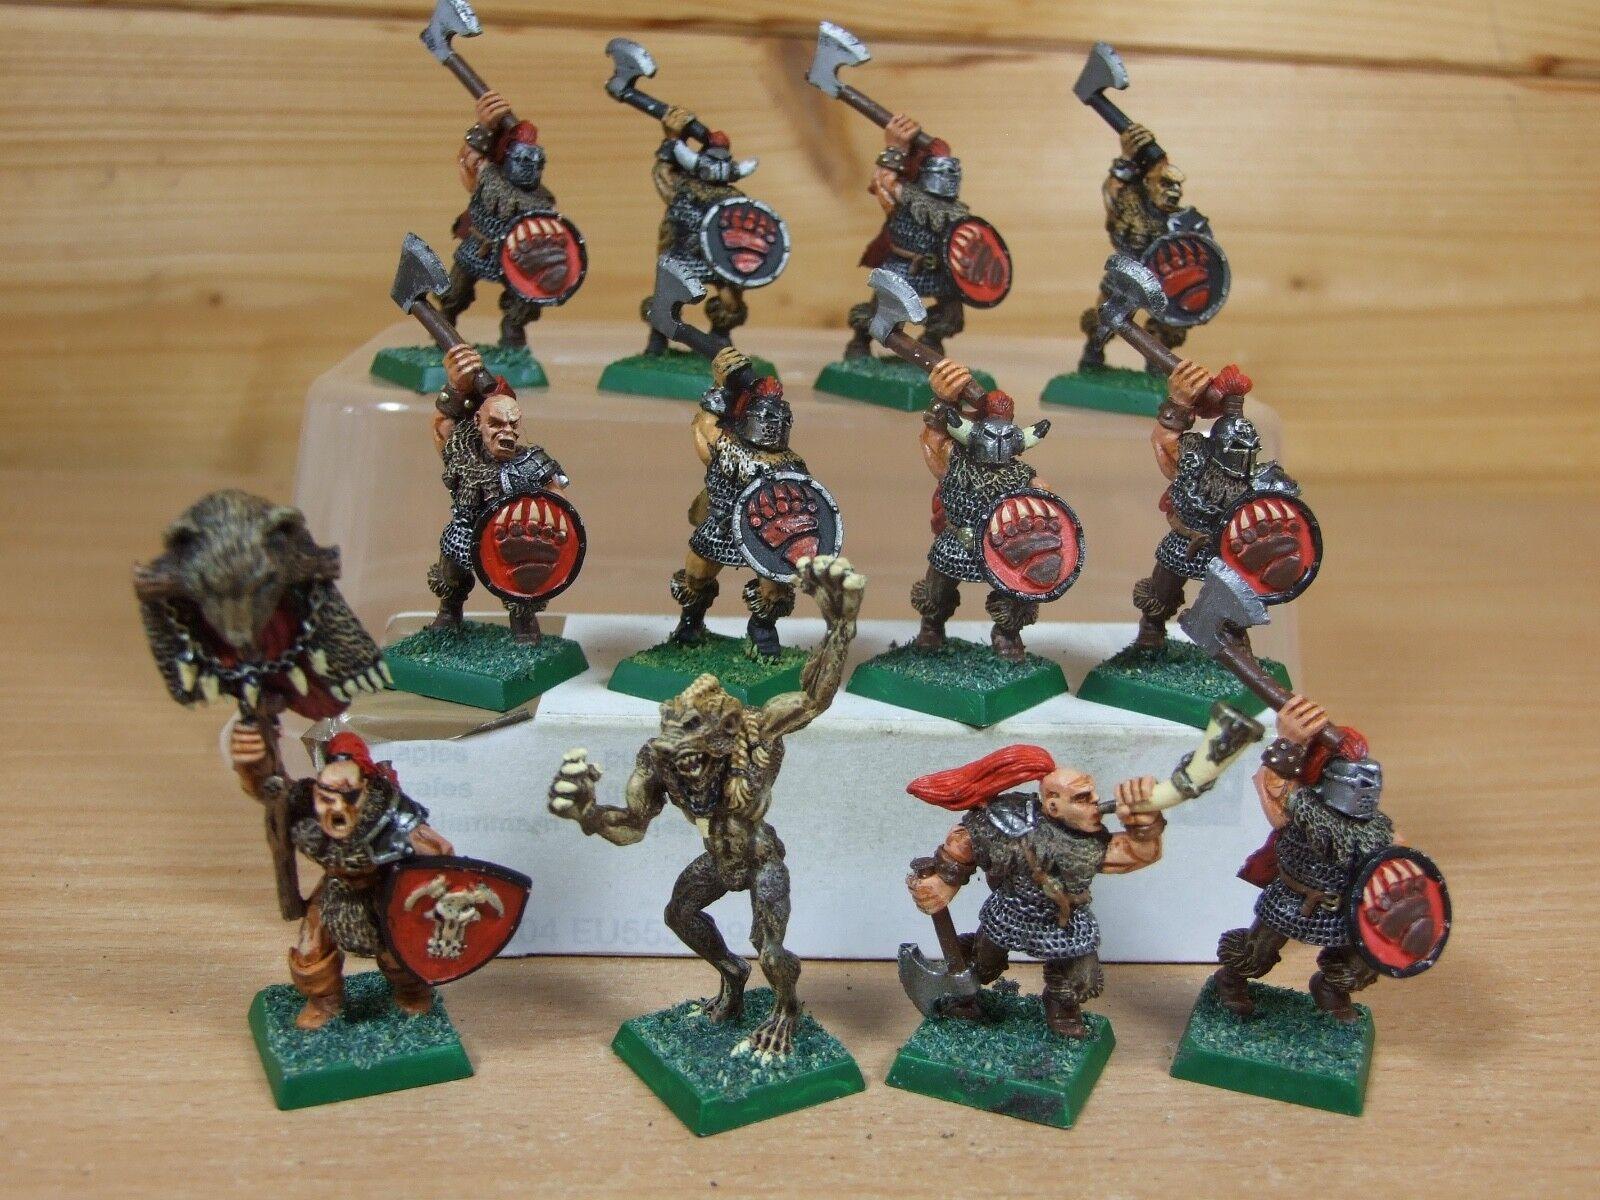 12 Classic Metal perros de guerra Beorg Bearstruck + bearmen hombres bien pintados (984)